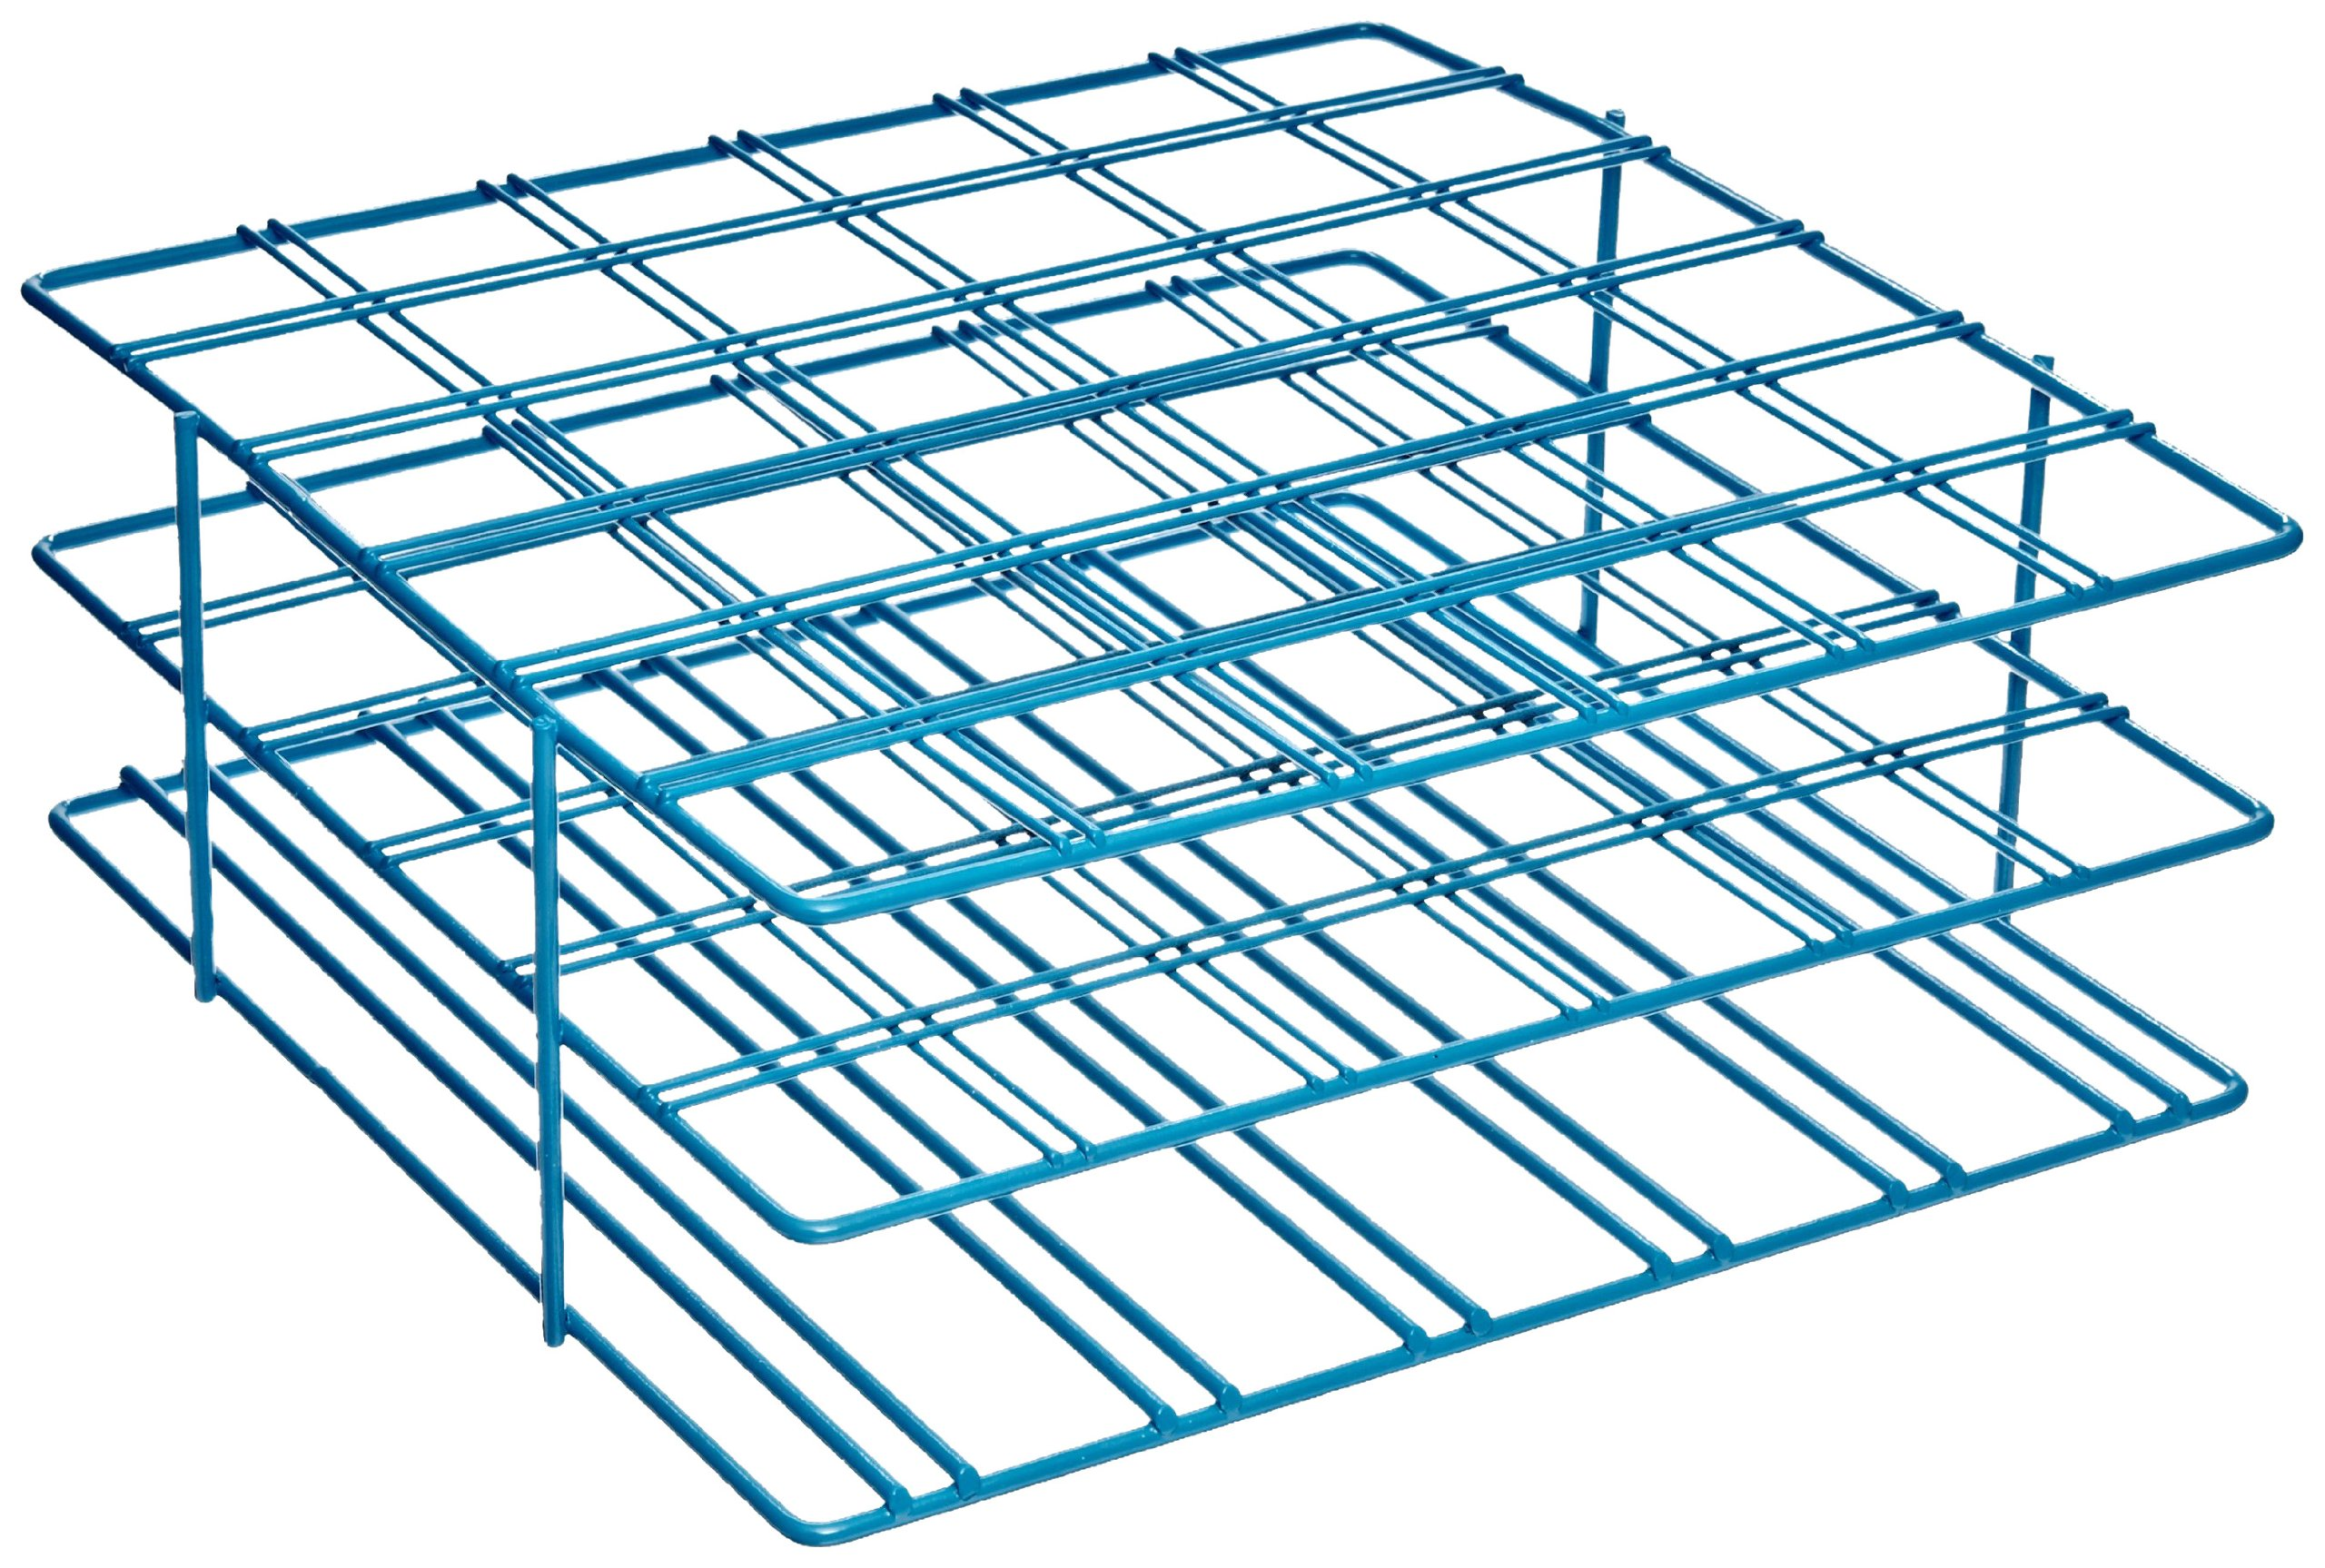 Bel-Art F18794-0002 Poxygrid Centrifuge Tube Rack; 50ml, 36 Places, 9 x 8⅞ x 3½ in., Blue